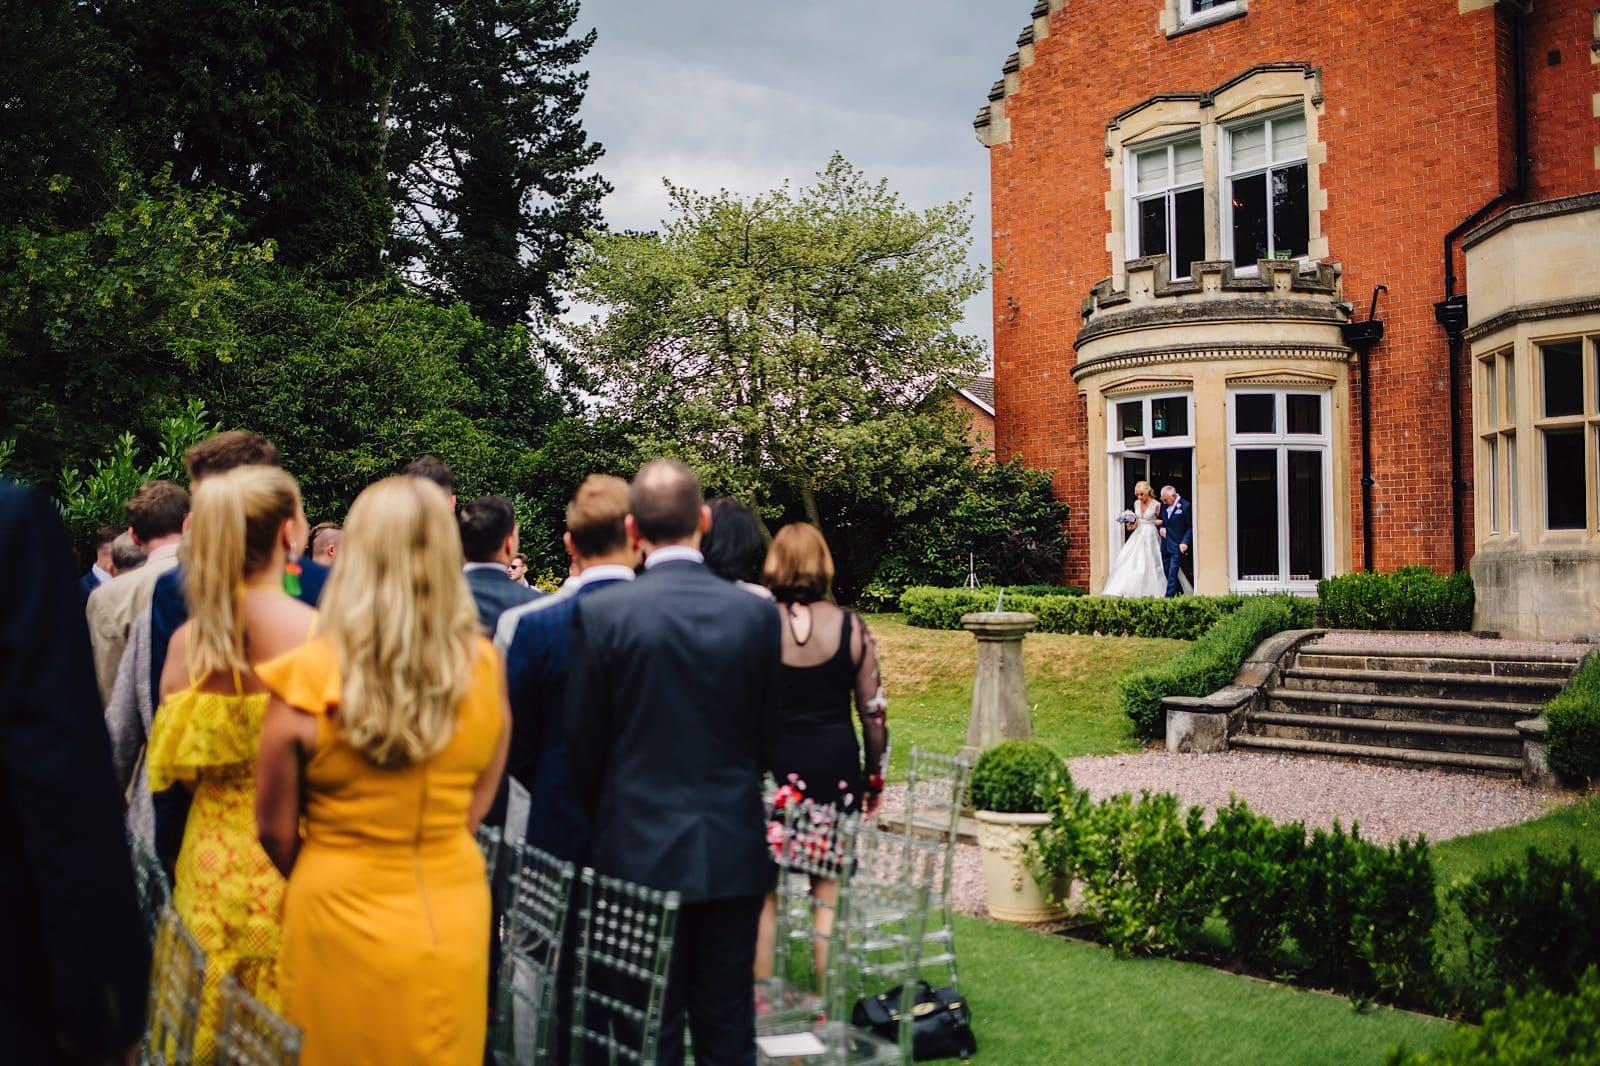 pendrell-hall-wedding-photography-0013